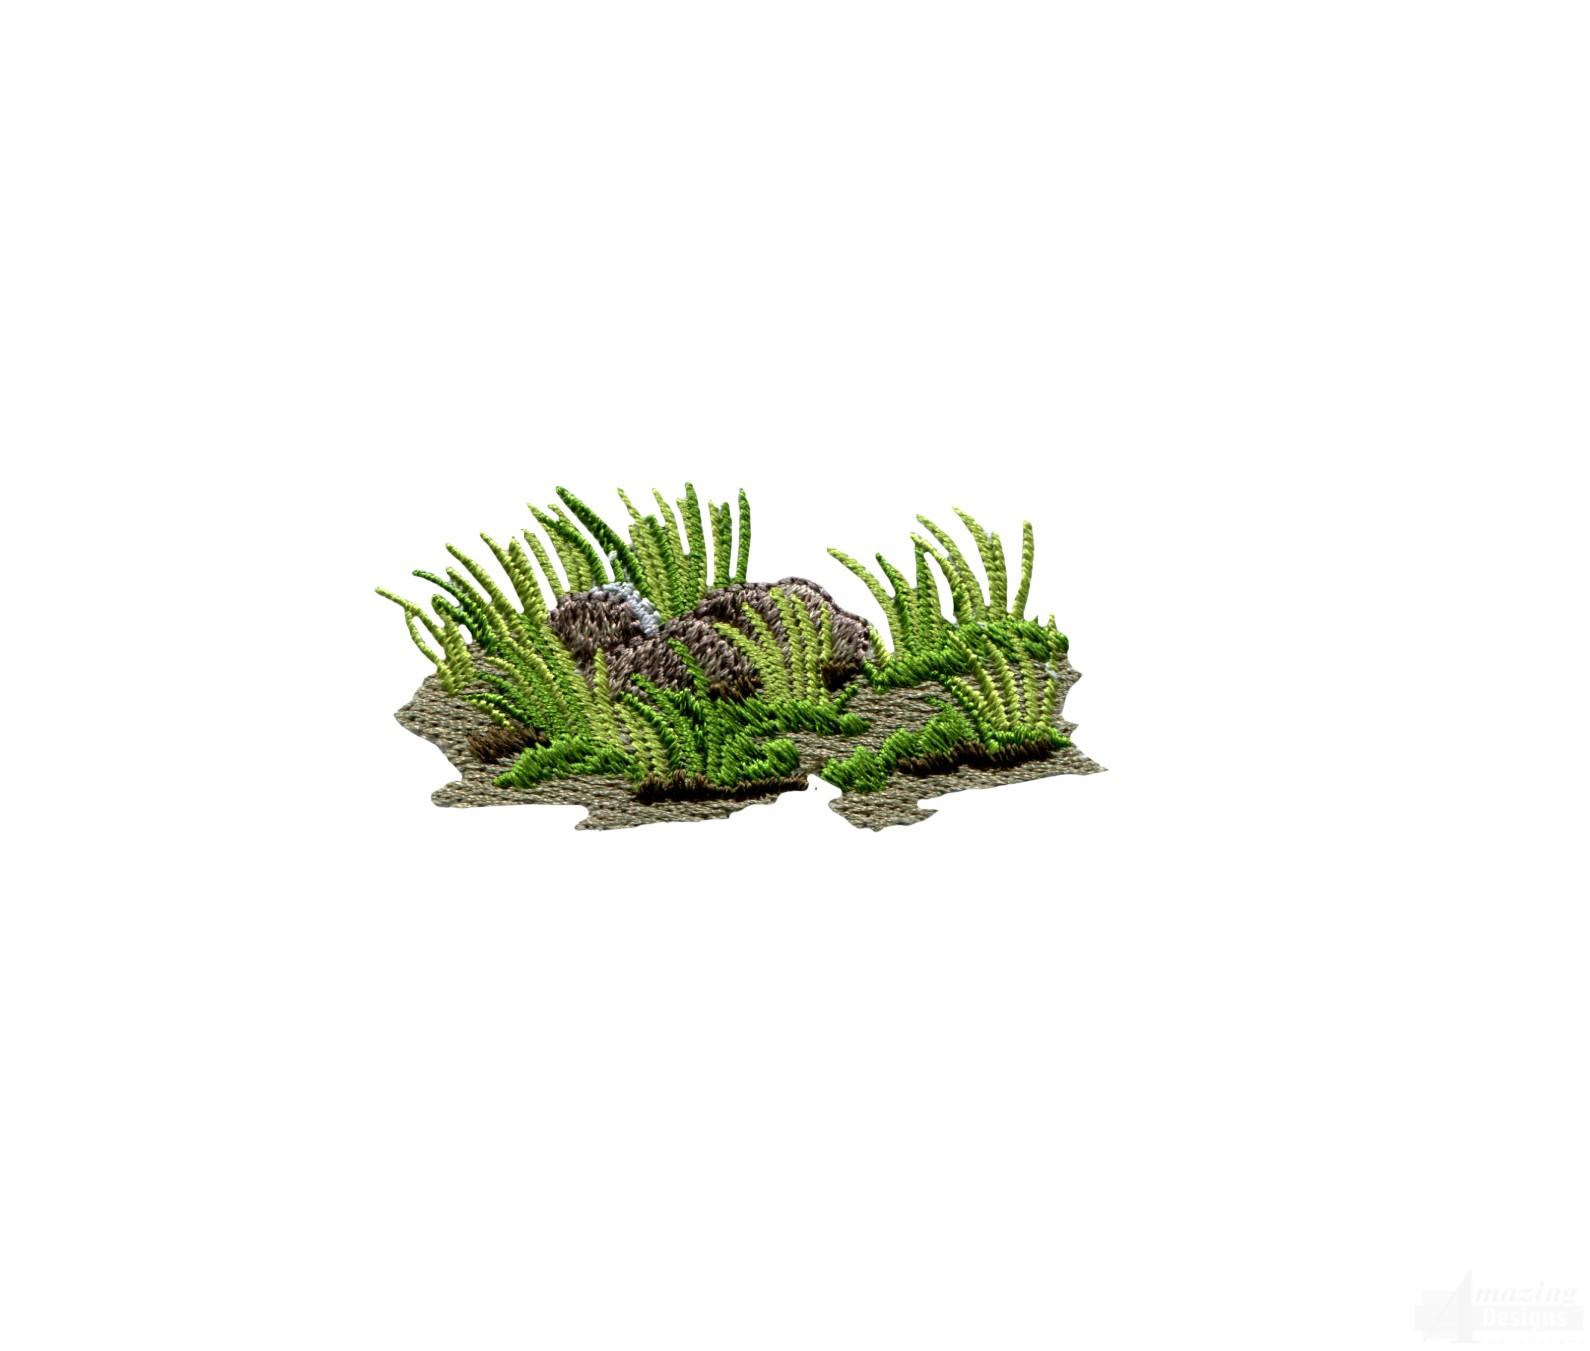 grass 2 embroidery design